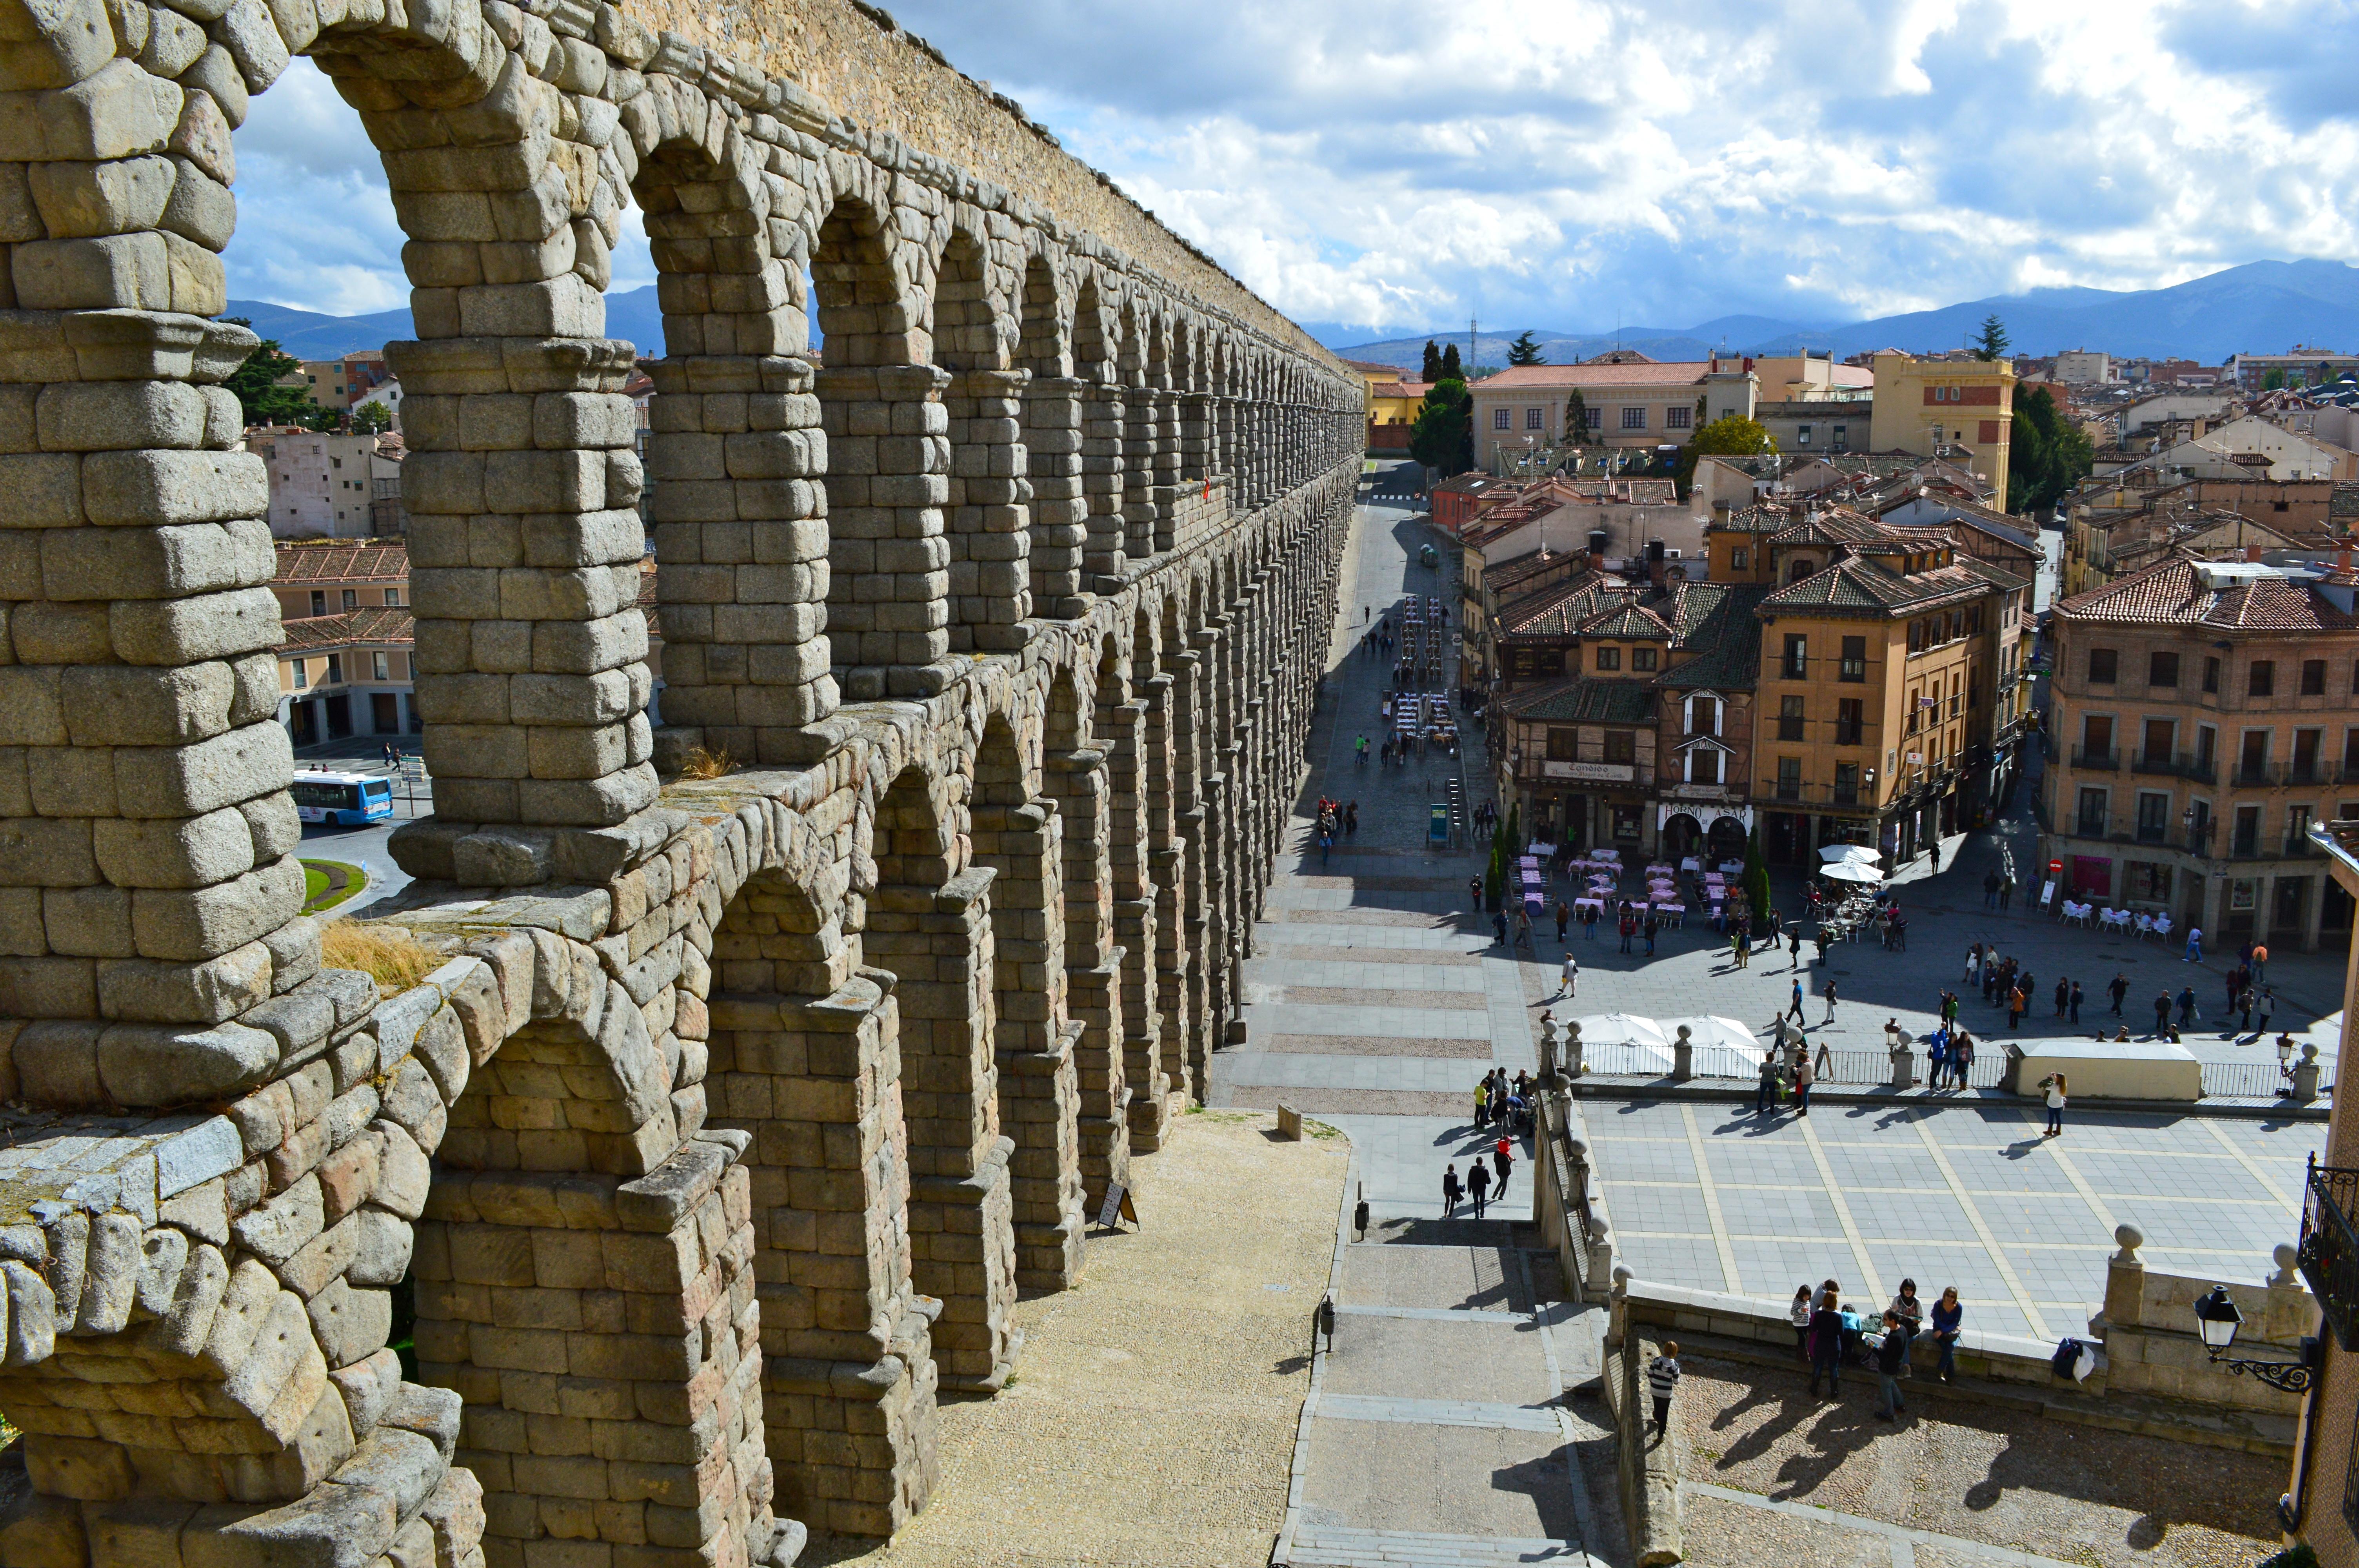 Fall 2013 la historia de segovia a trav s de su arquitectura johns hopkins program in madrid - Acueducto de segovia arquitectura ...